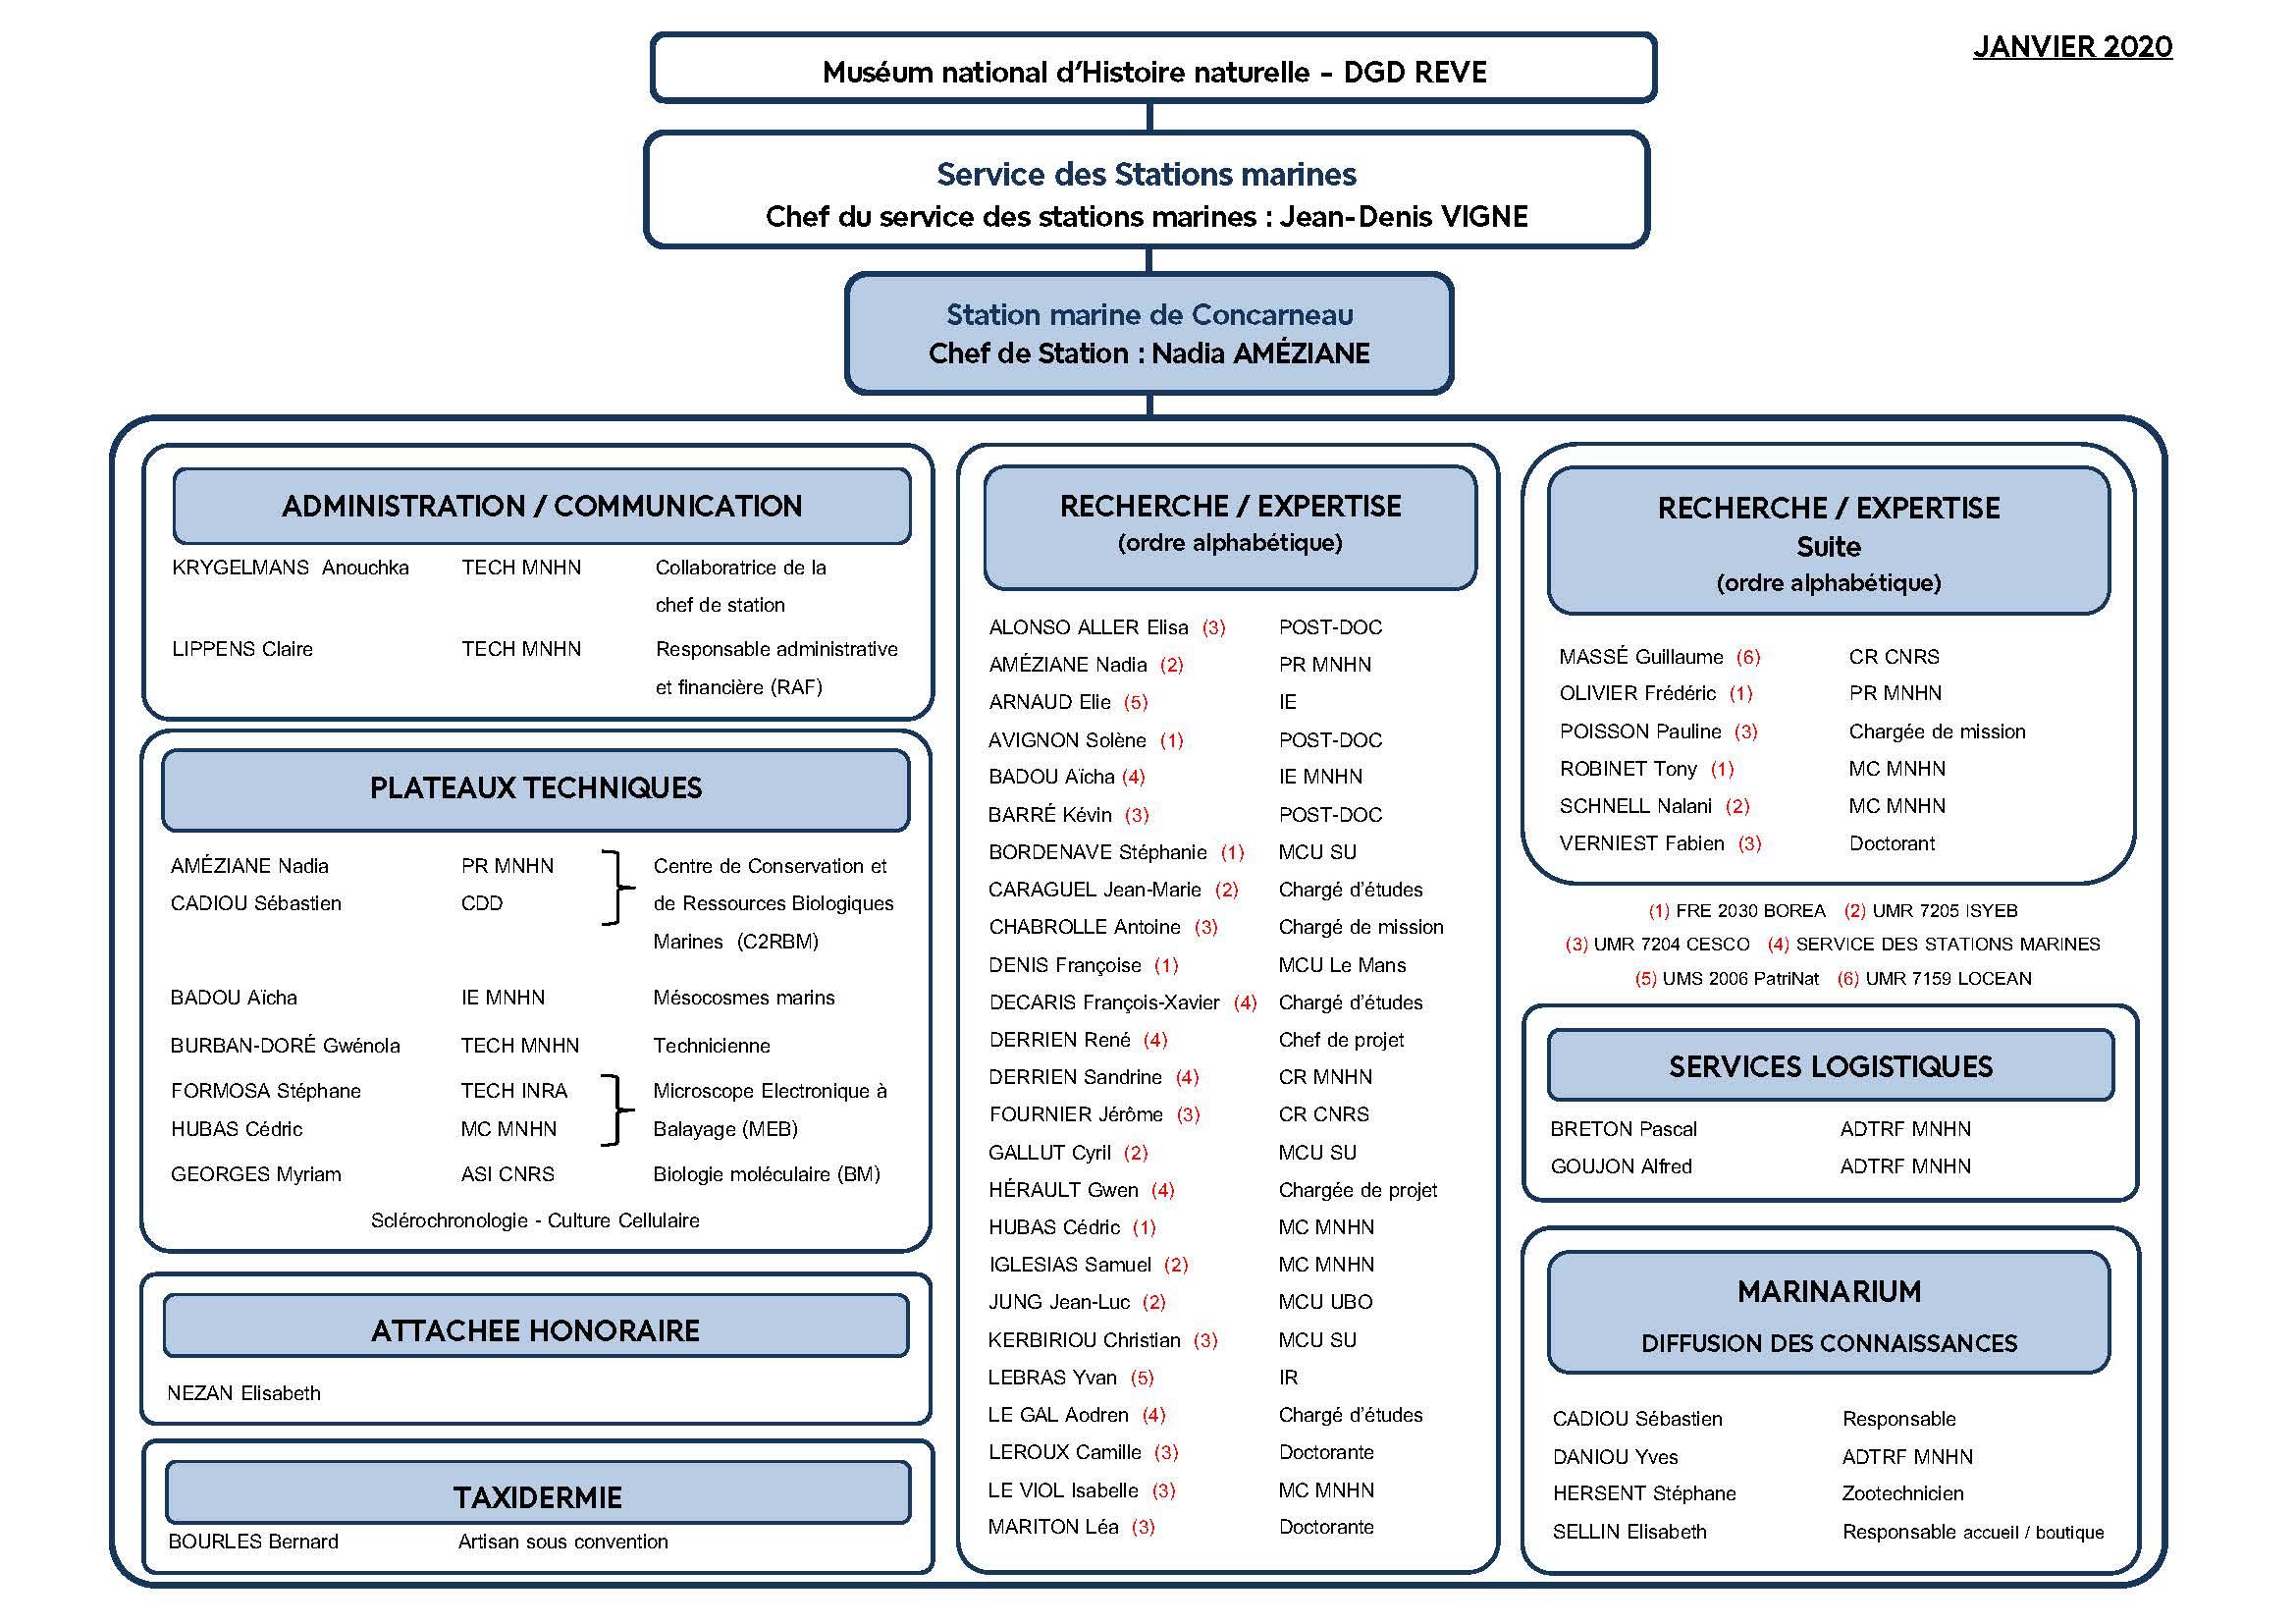 Organigramme de la Station marine de Concarneau 2020